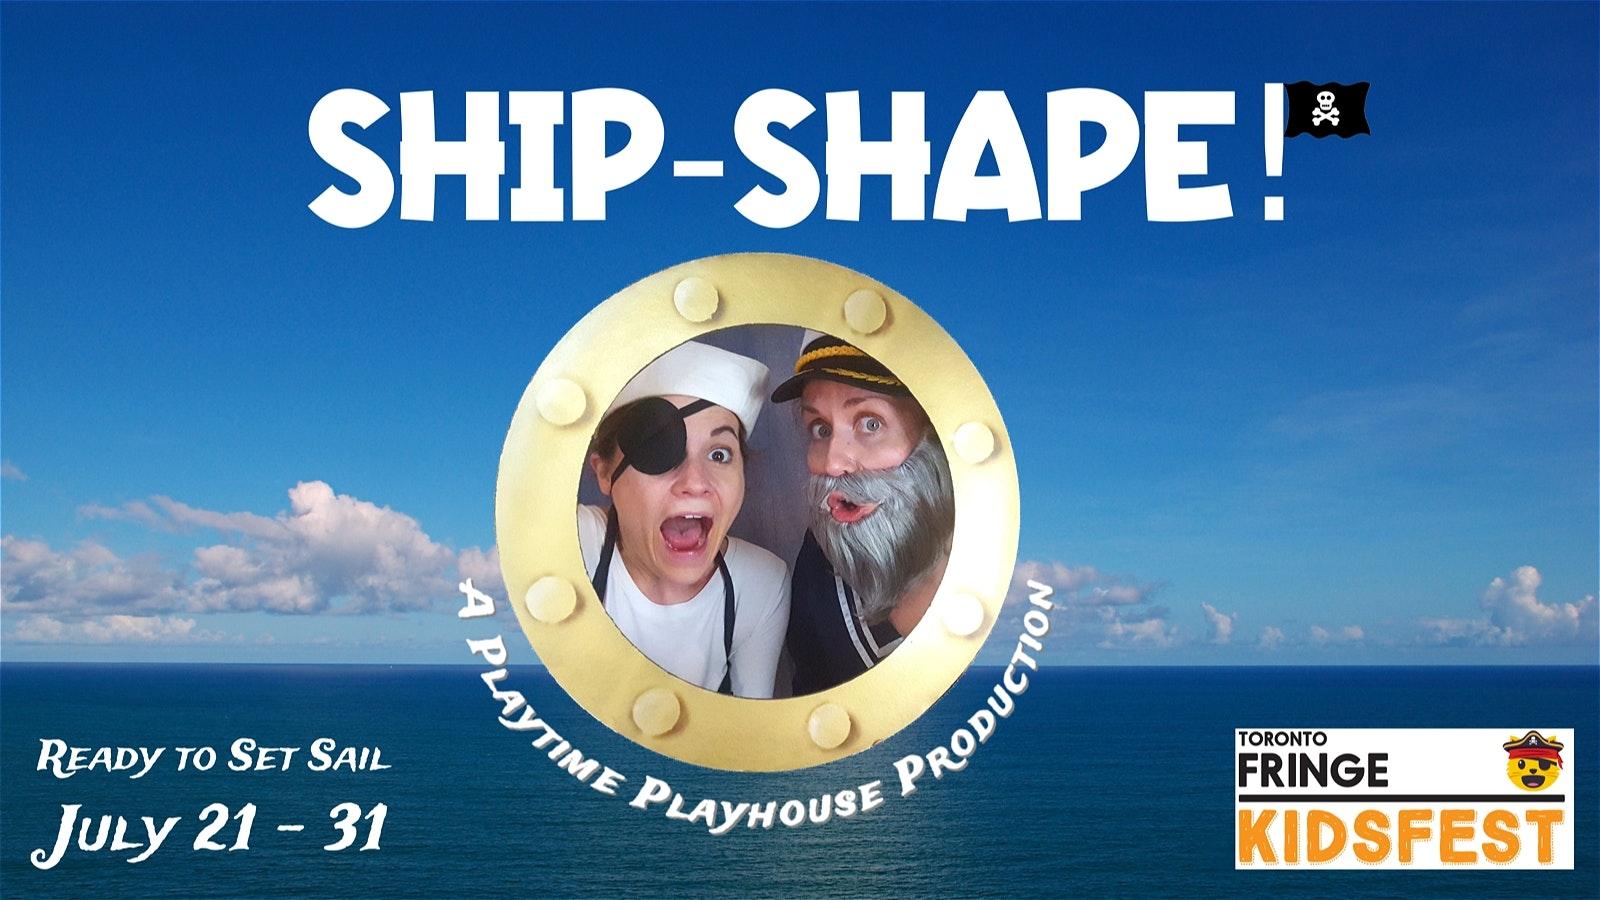 Ship-Shape!